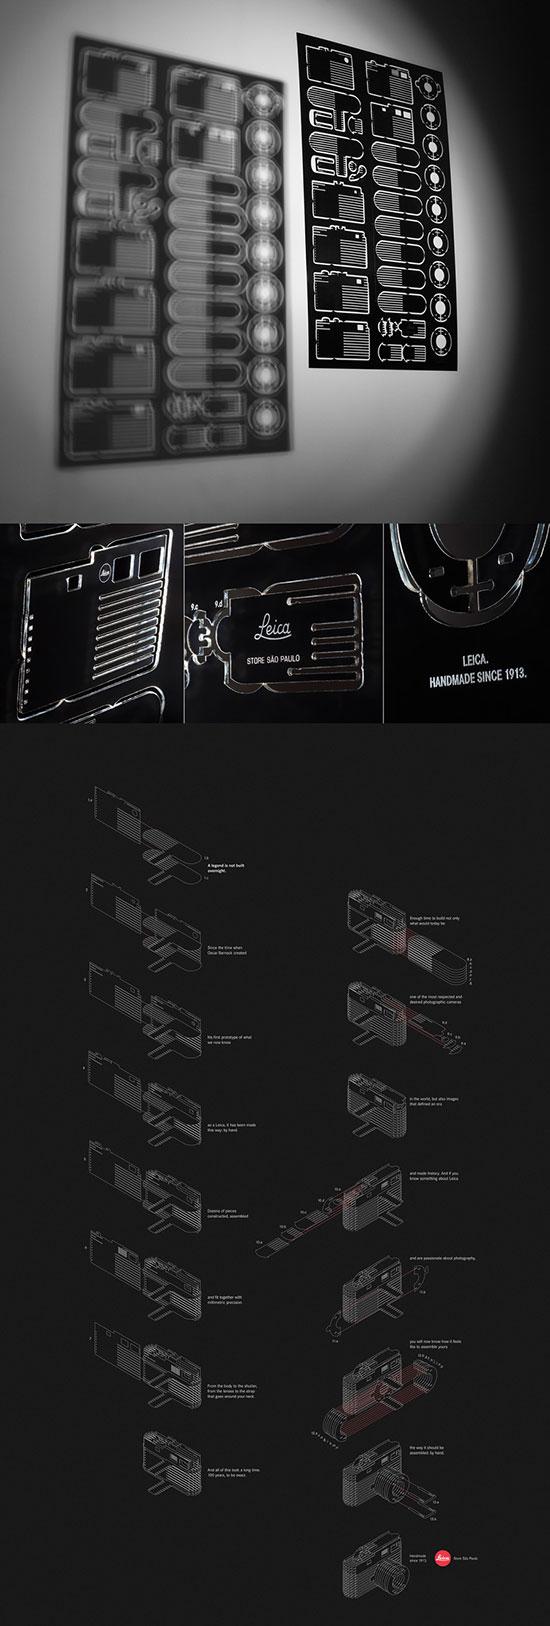 DIY-Leica-camera-assembly-kit